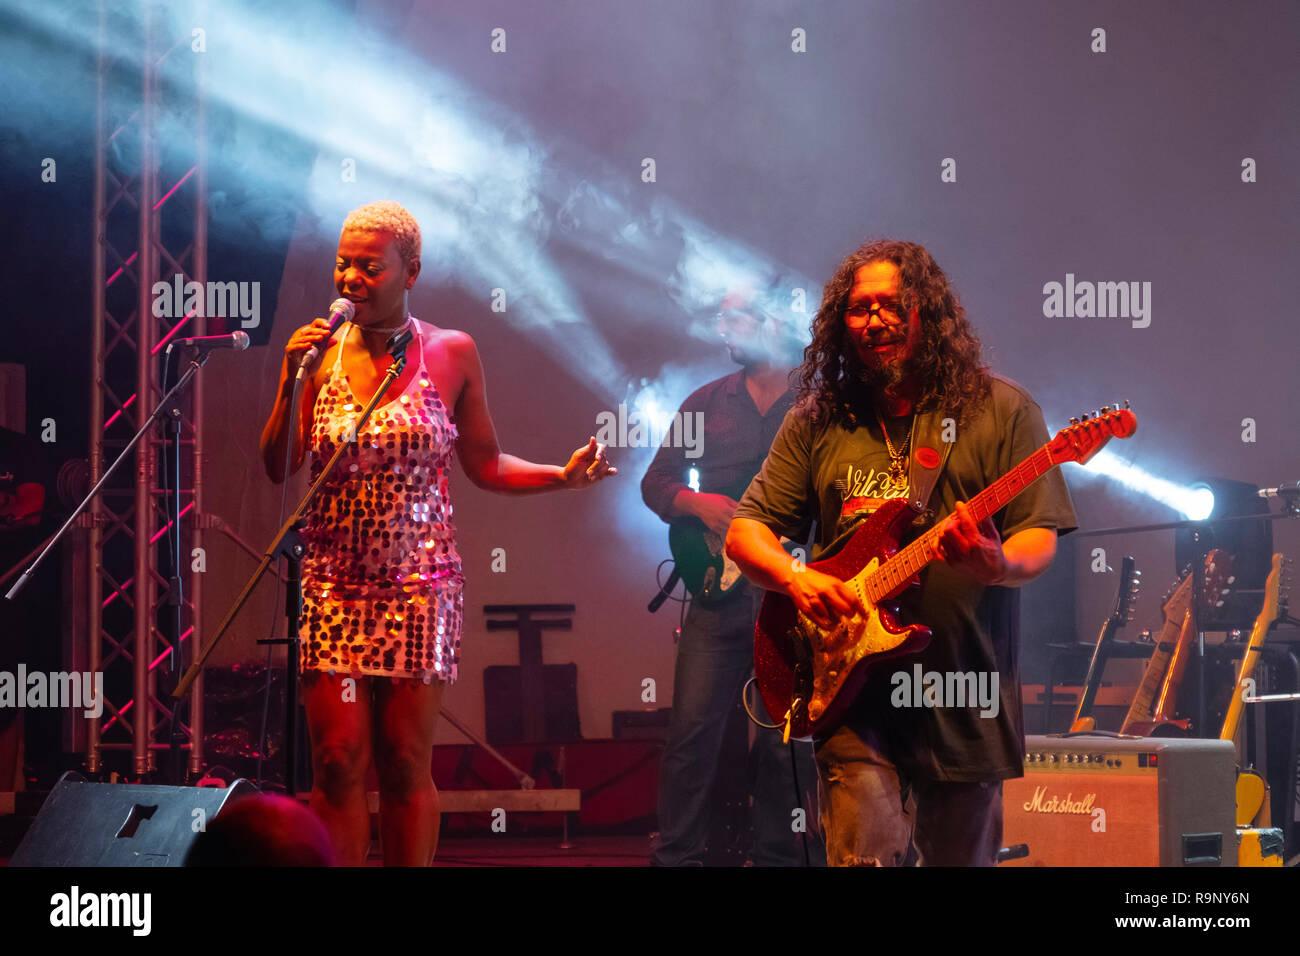 Musician Raimundo Amador. Summer music festival concert, white village of Mijas Pueblo. Malaga province, Costal del Sol. Andalusia, Southern Spain. Eu - Stock Image